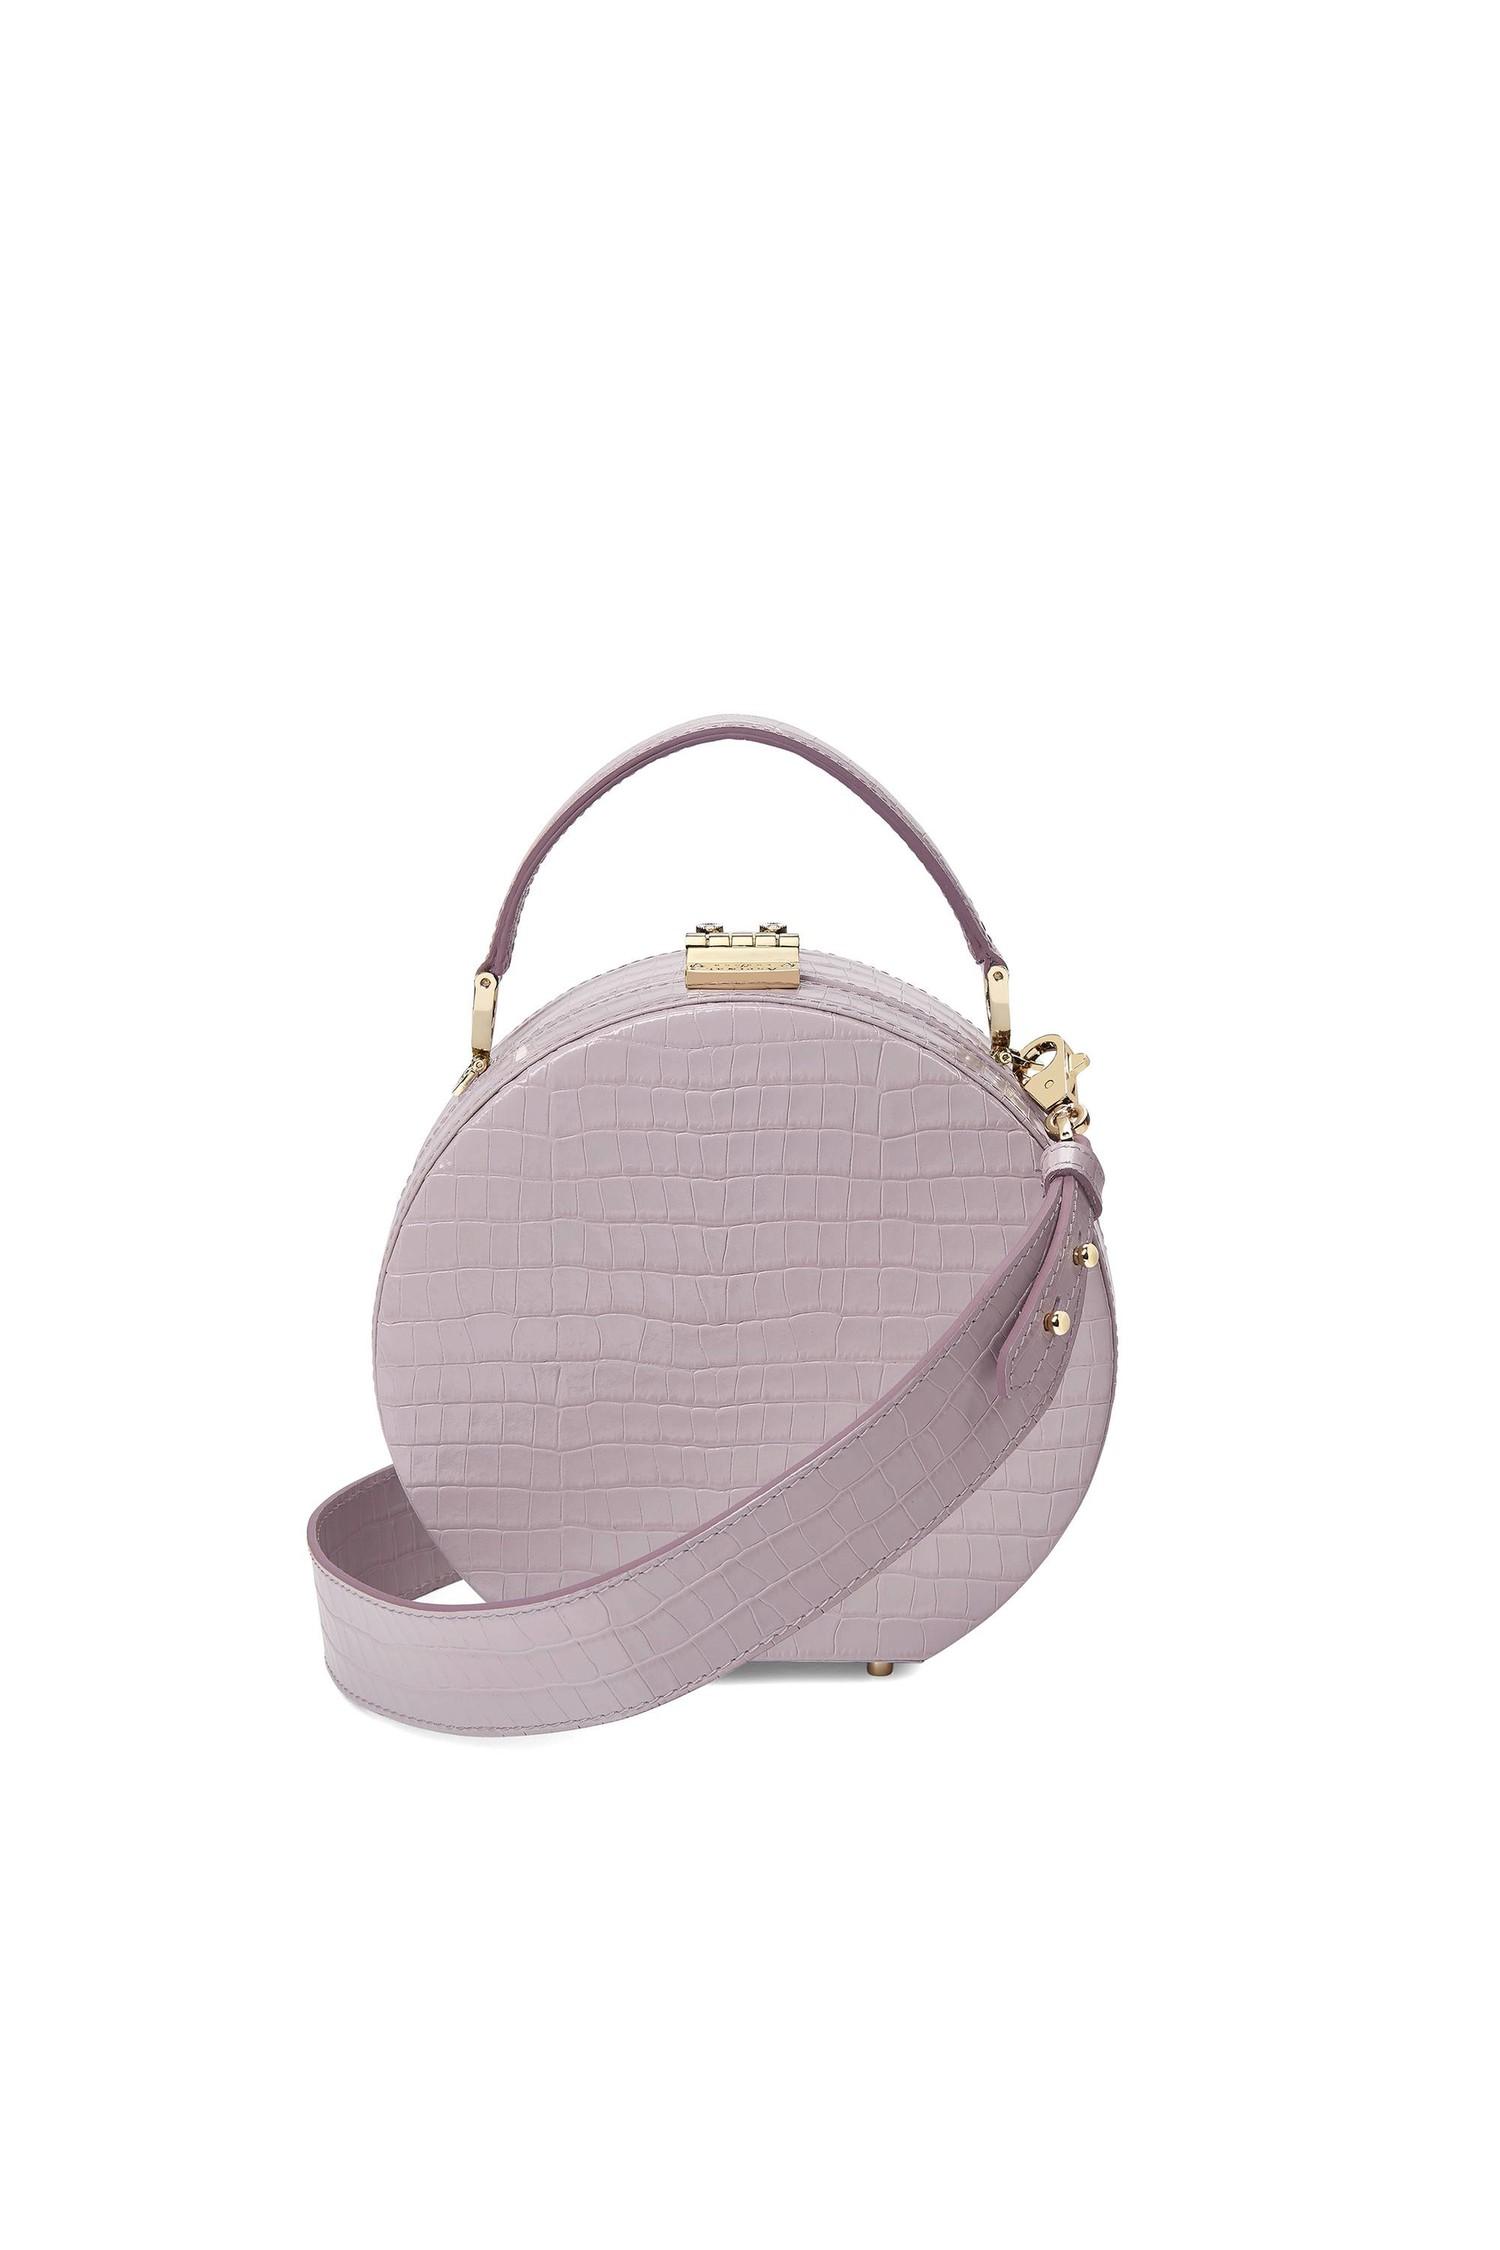 Aspinal of London Mini Hat Box Bag , $870